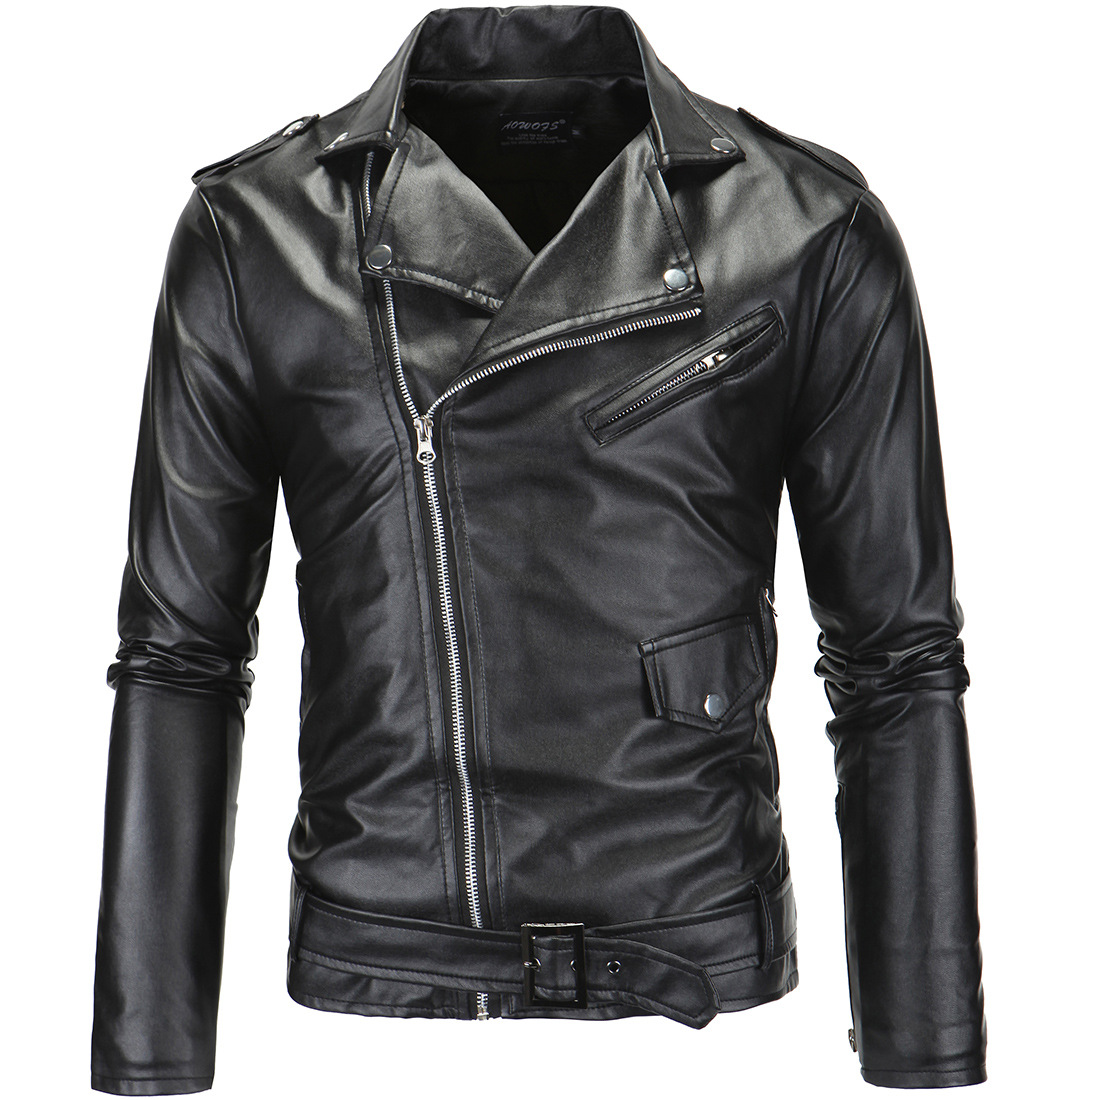 Herren Leder Jacken Mäntel Dauerhafte Modellierung Neue Kommen Marke Motorrad Leder Jacke Männer Männer Leder Jacke Jaqueta De Couro Masculina